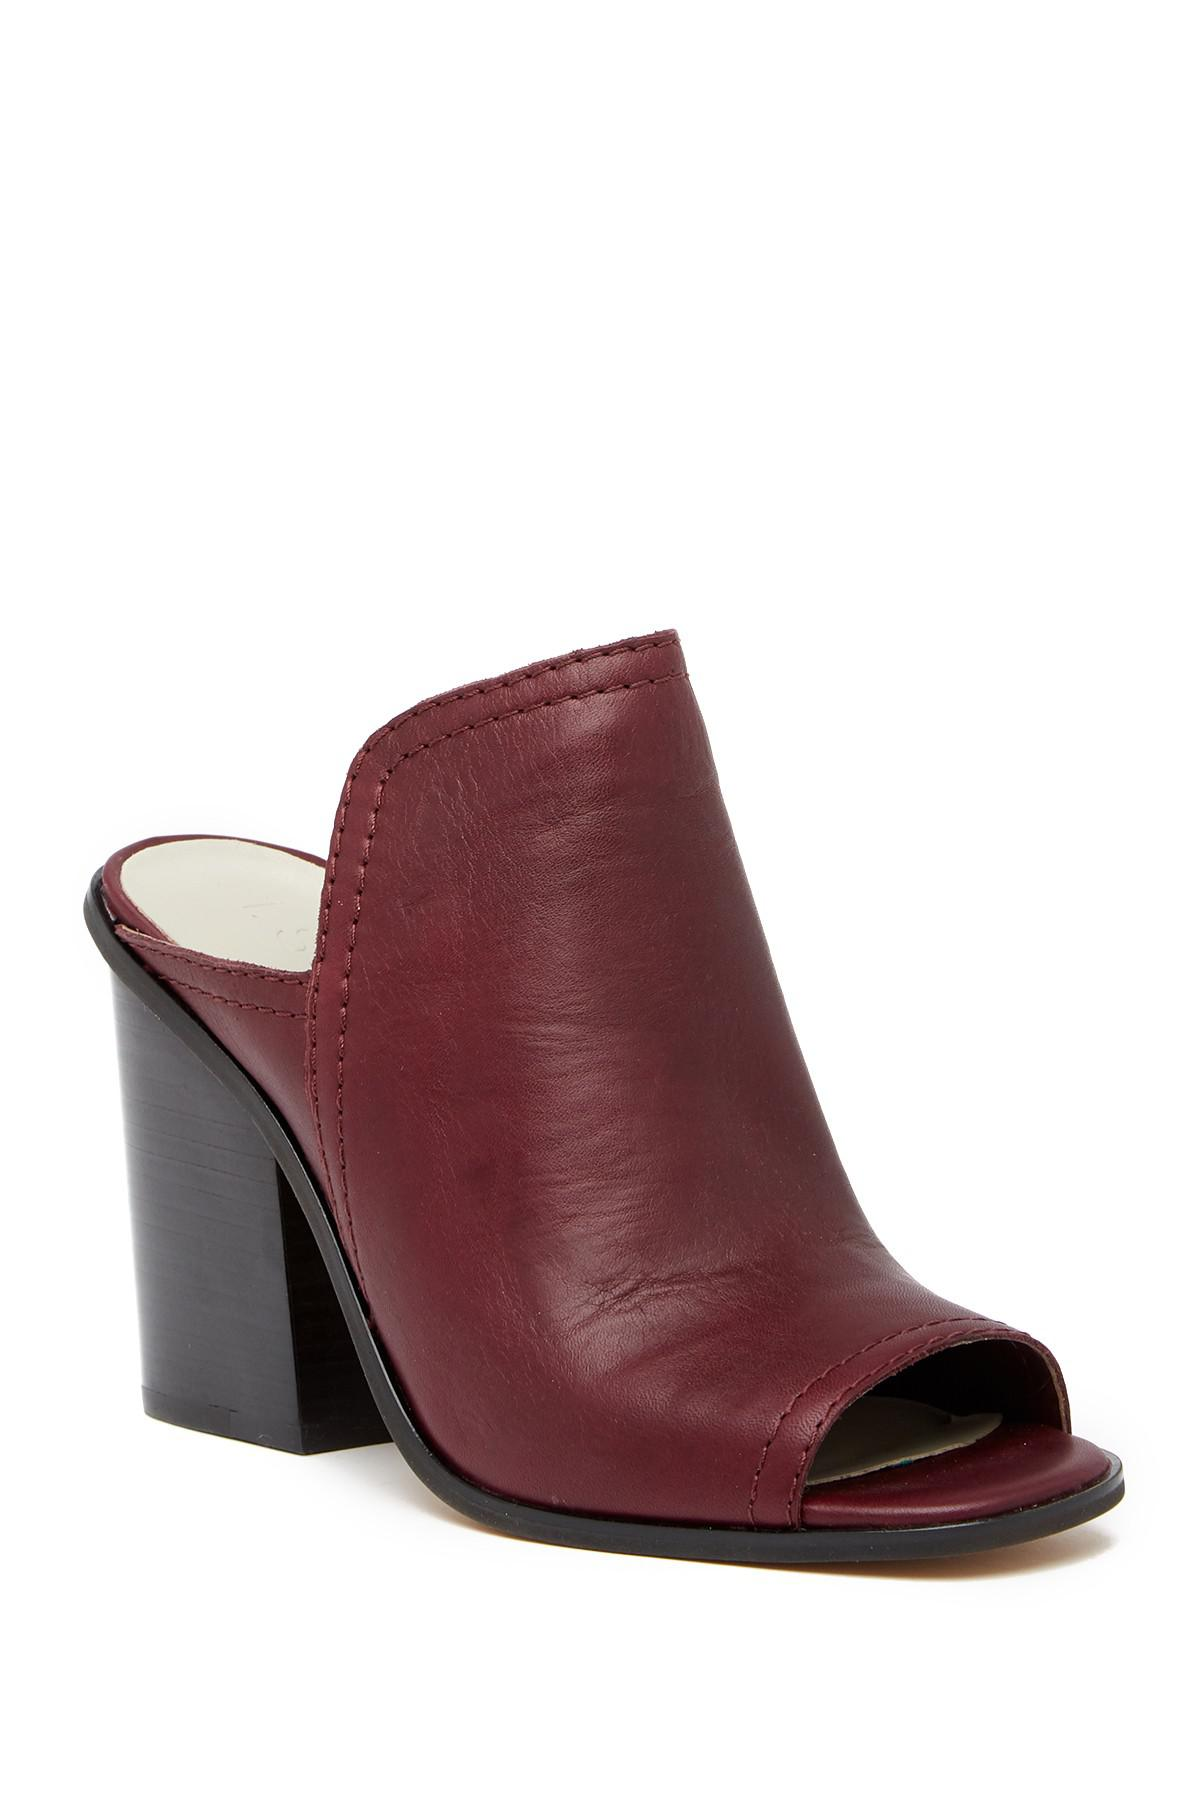 1.State Fernan Block Heel Slide Sandal